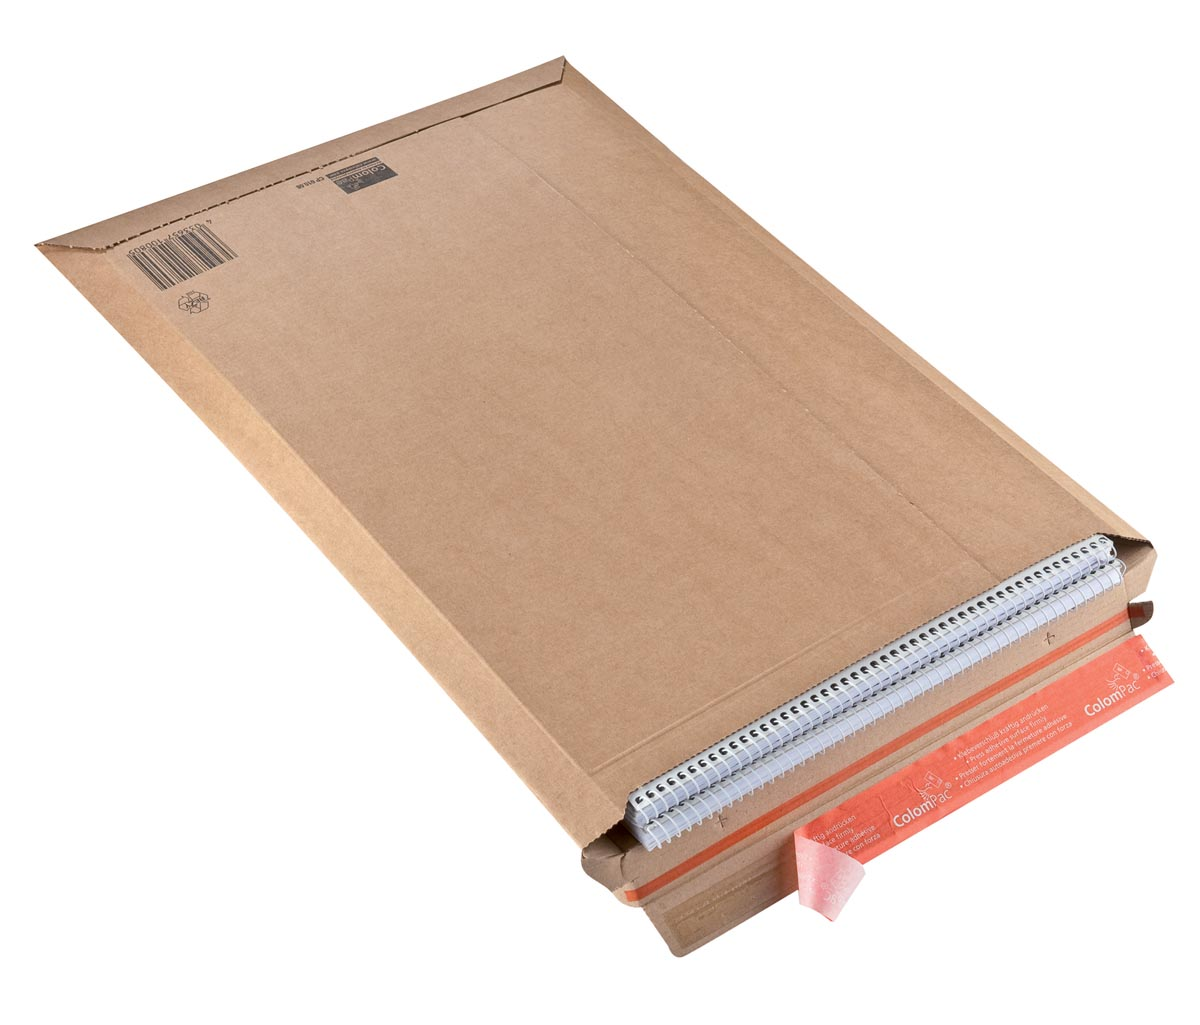 Colompac verzendenvelop CP010, ft 34 x 50 x 5 cm, bruin